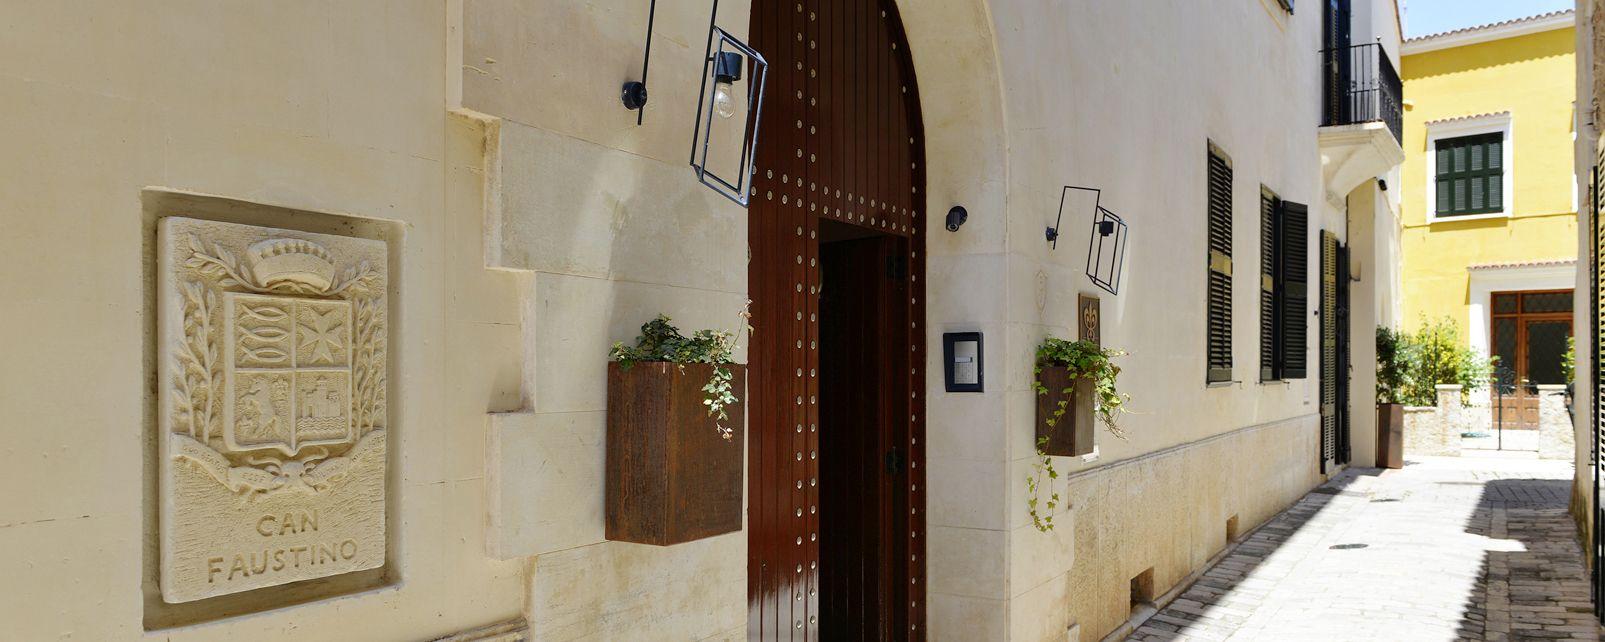 Hôtel Can Faustino